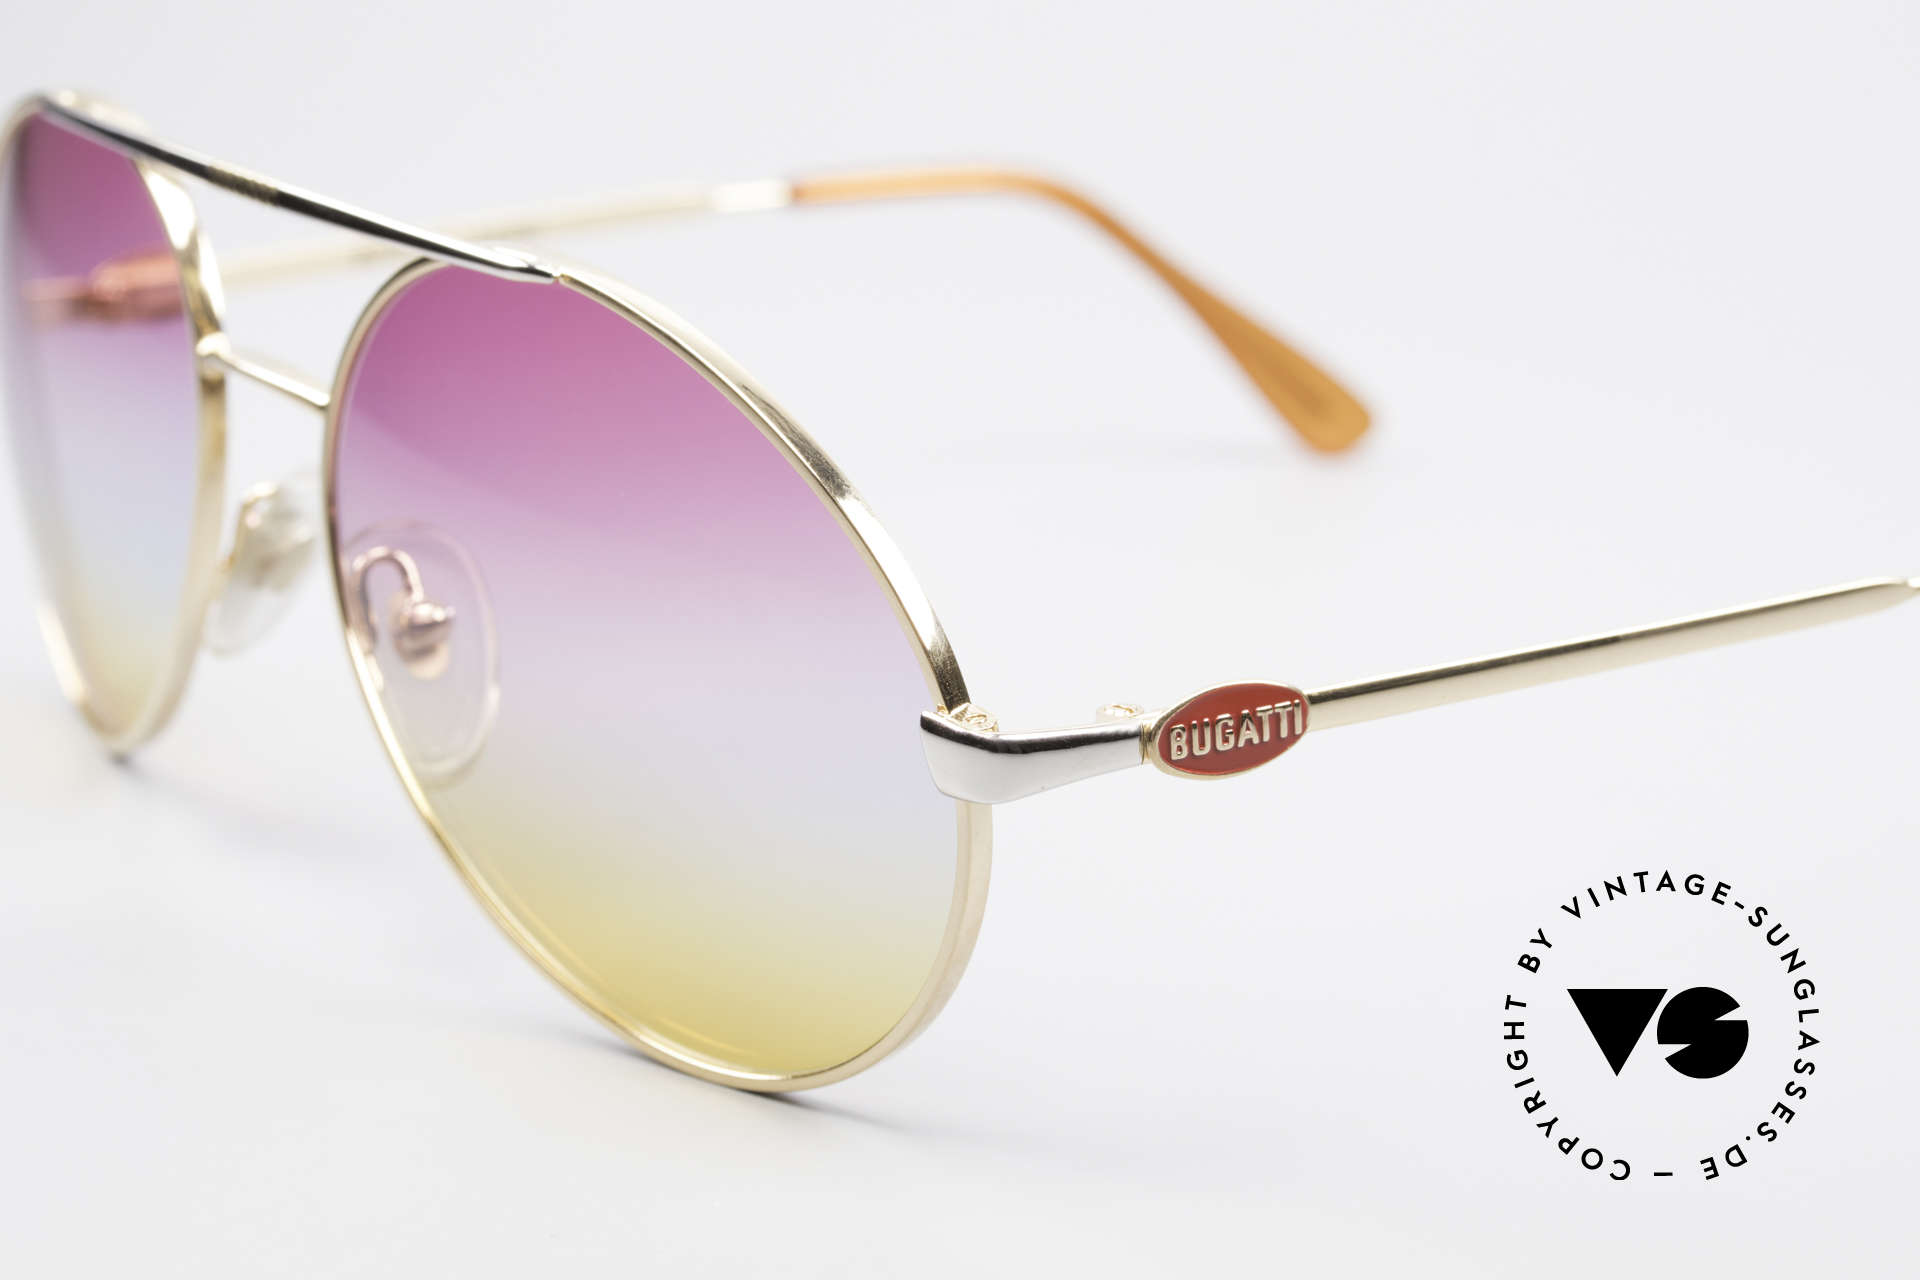 Bugatti 64320 Rare 80's Sunglasses Vintage, golden finish with tricolored gradient lenses, Made for Men